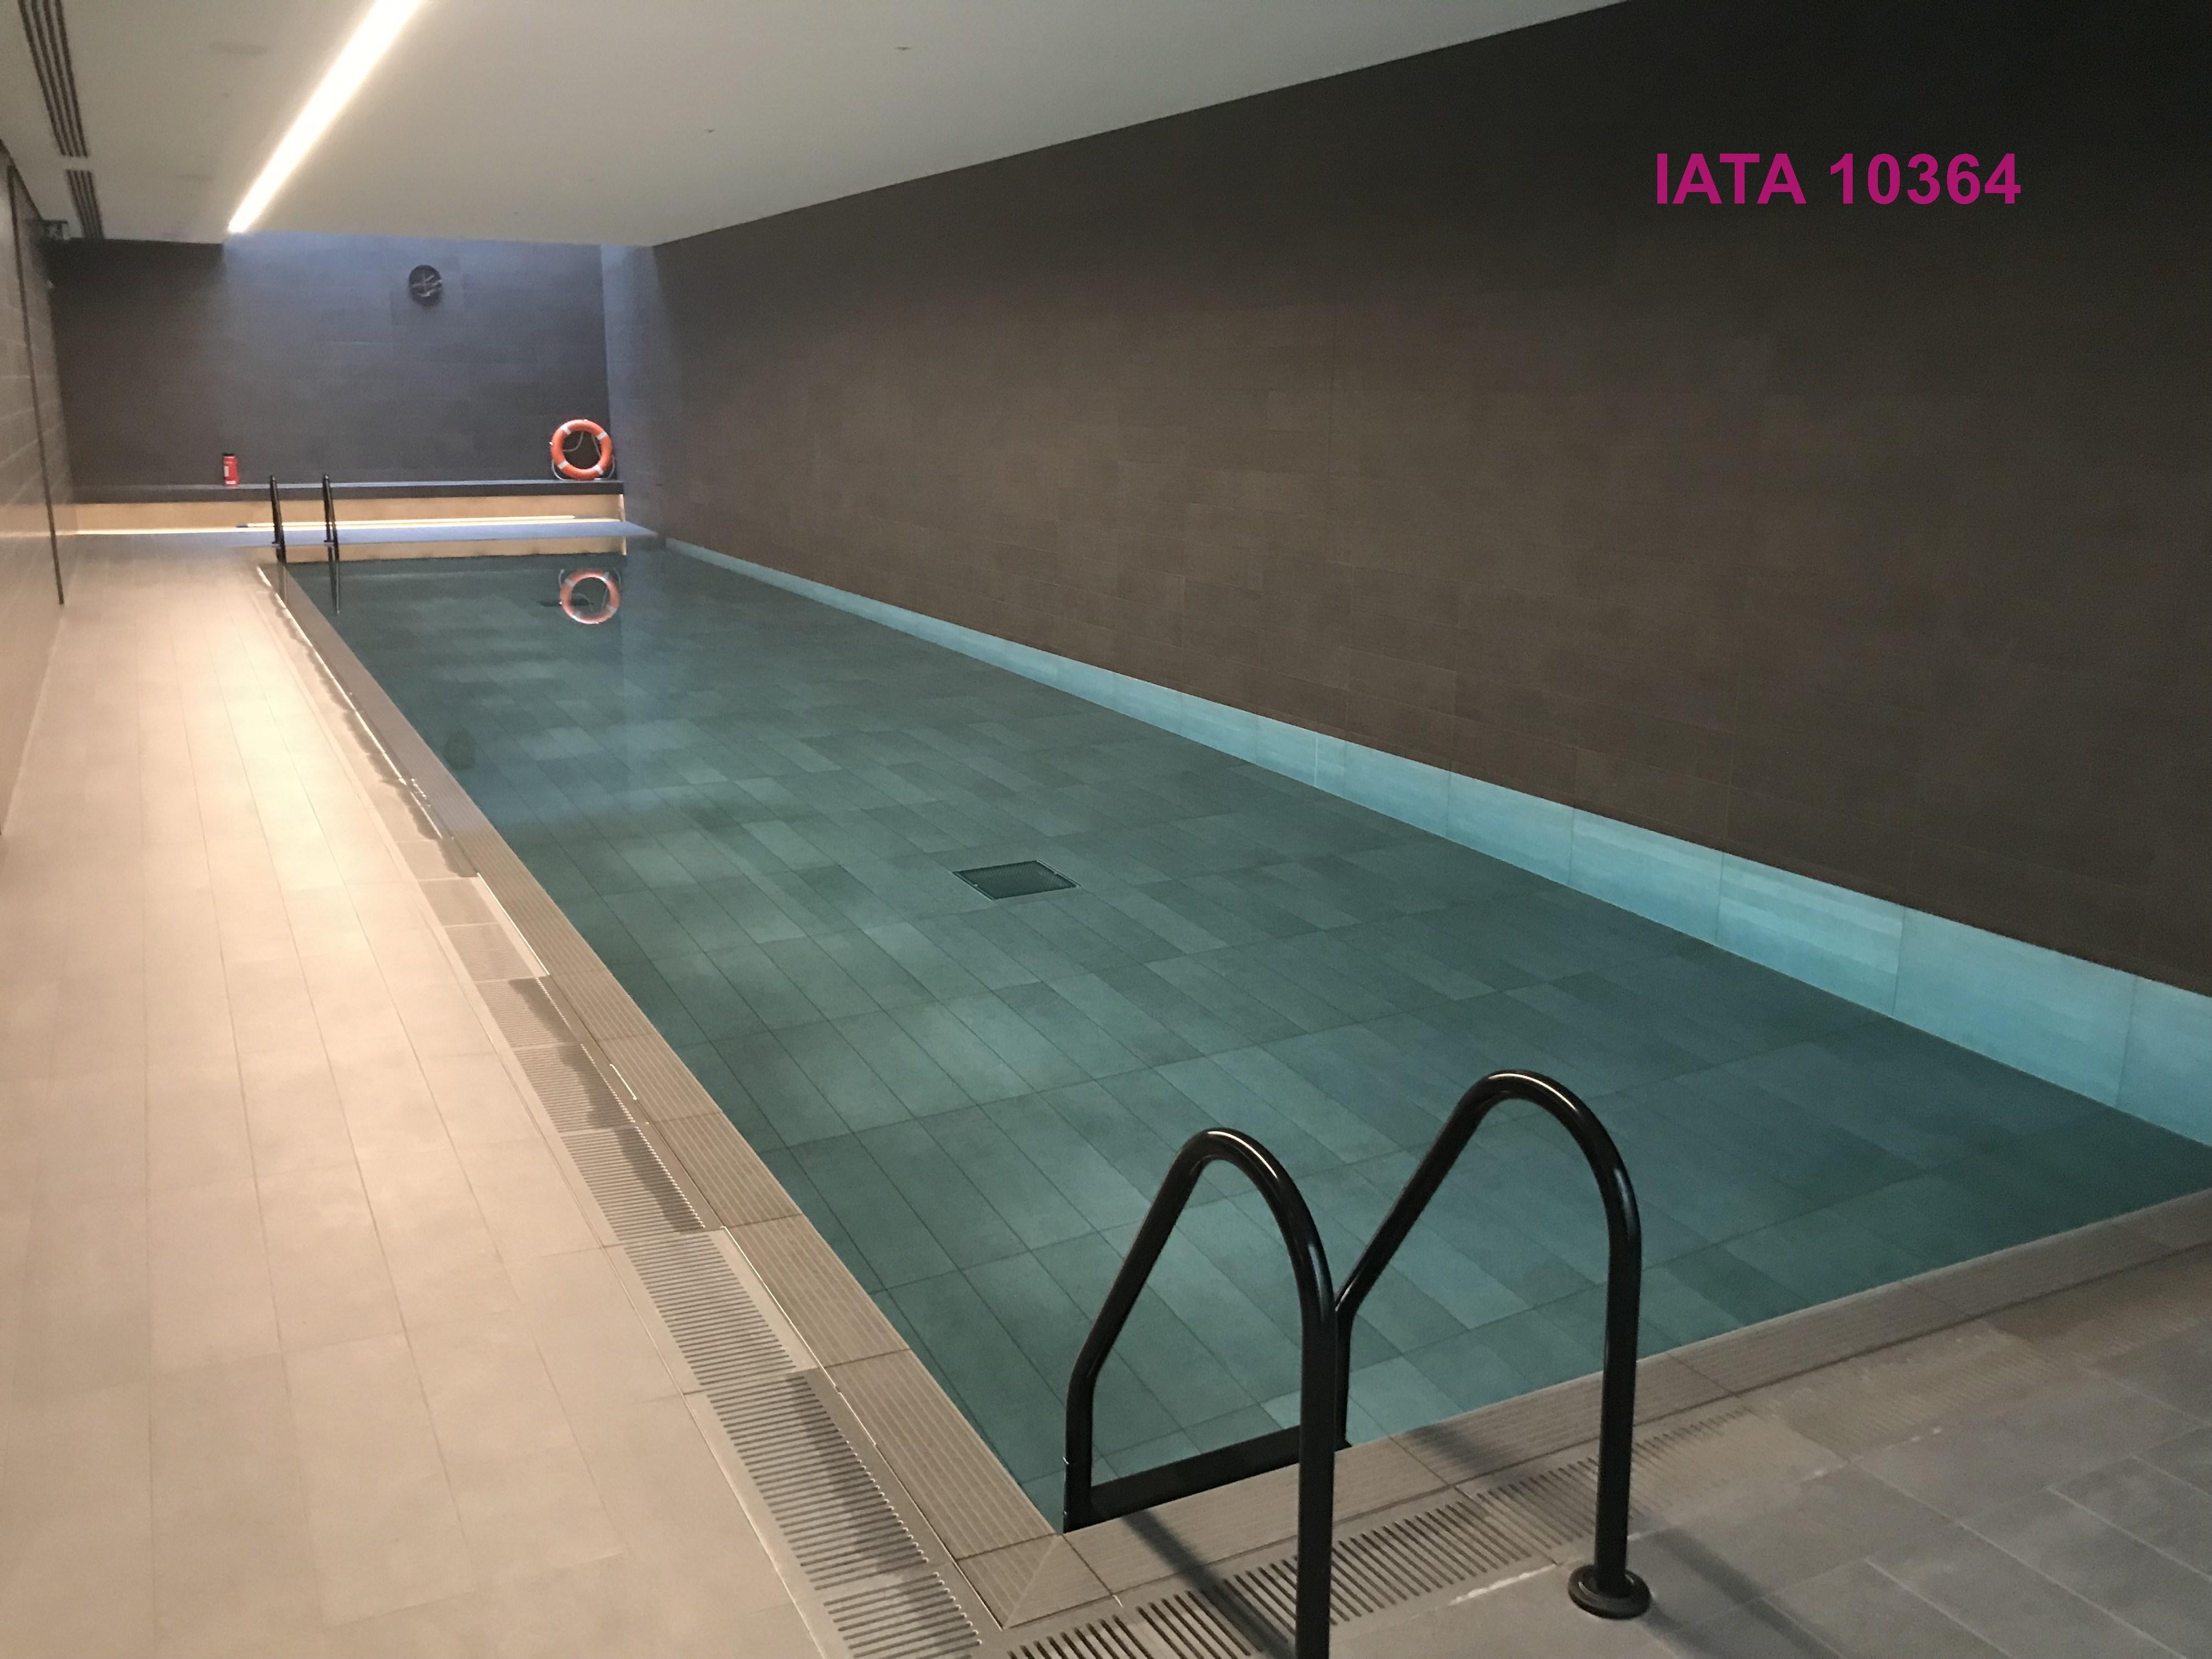 Rathbone Square,Pool & Sport